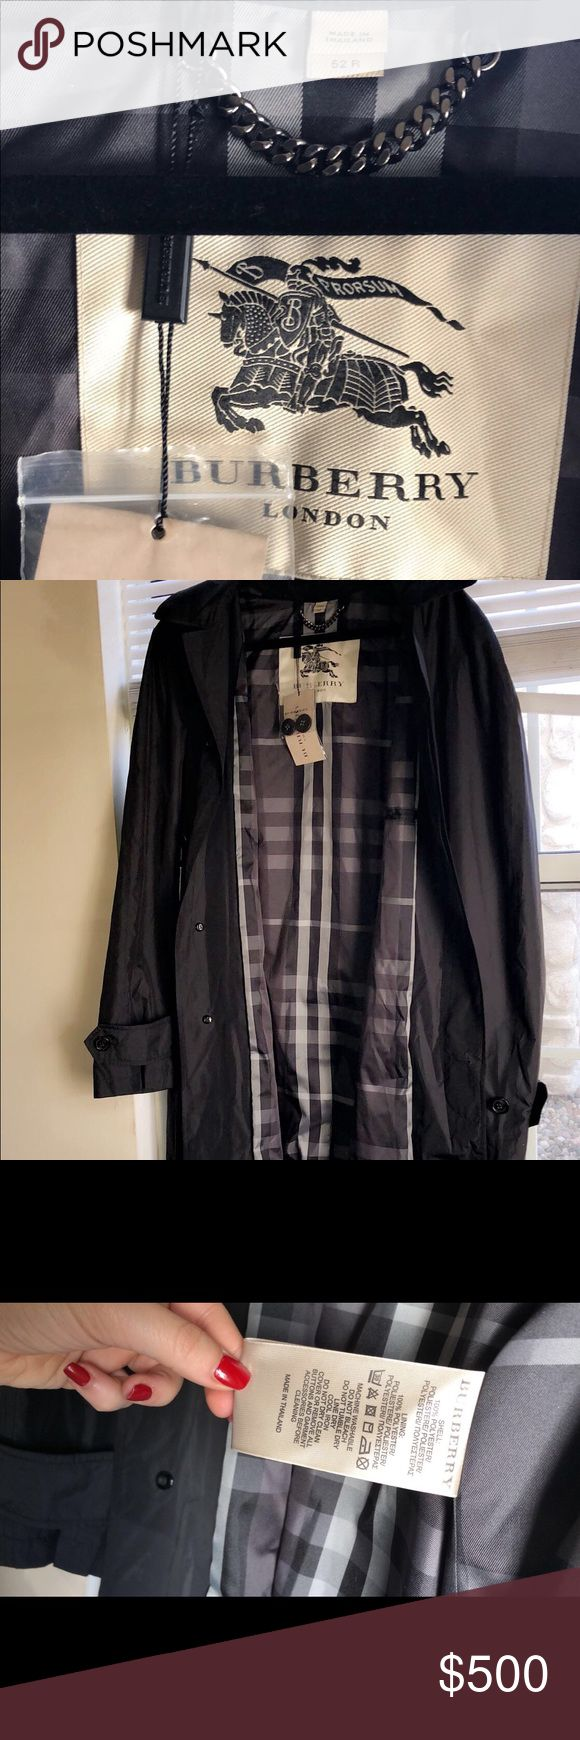 Burberry Mens Rain coat Brand new rain coat. Never worn. Comes in Burberry box. Jackets & Coats Trench Coats